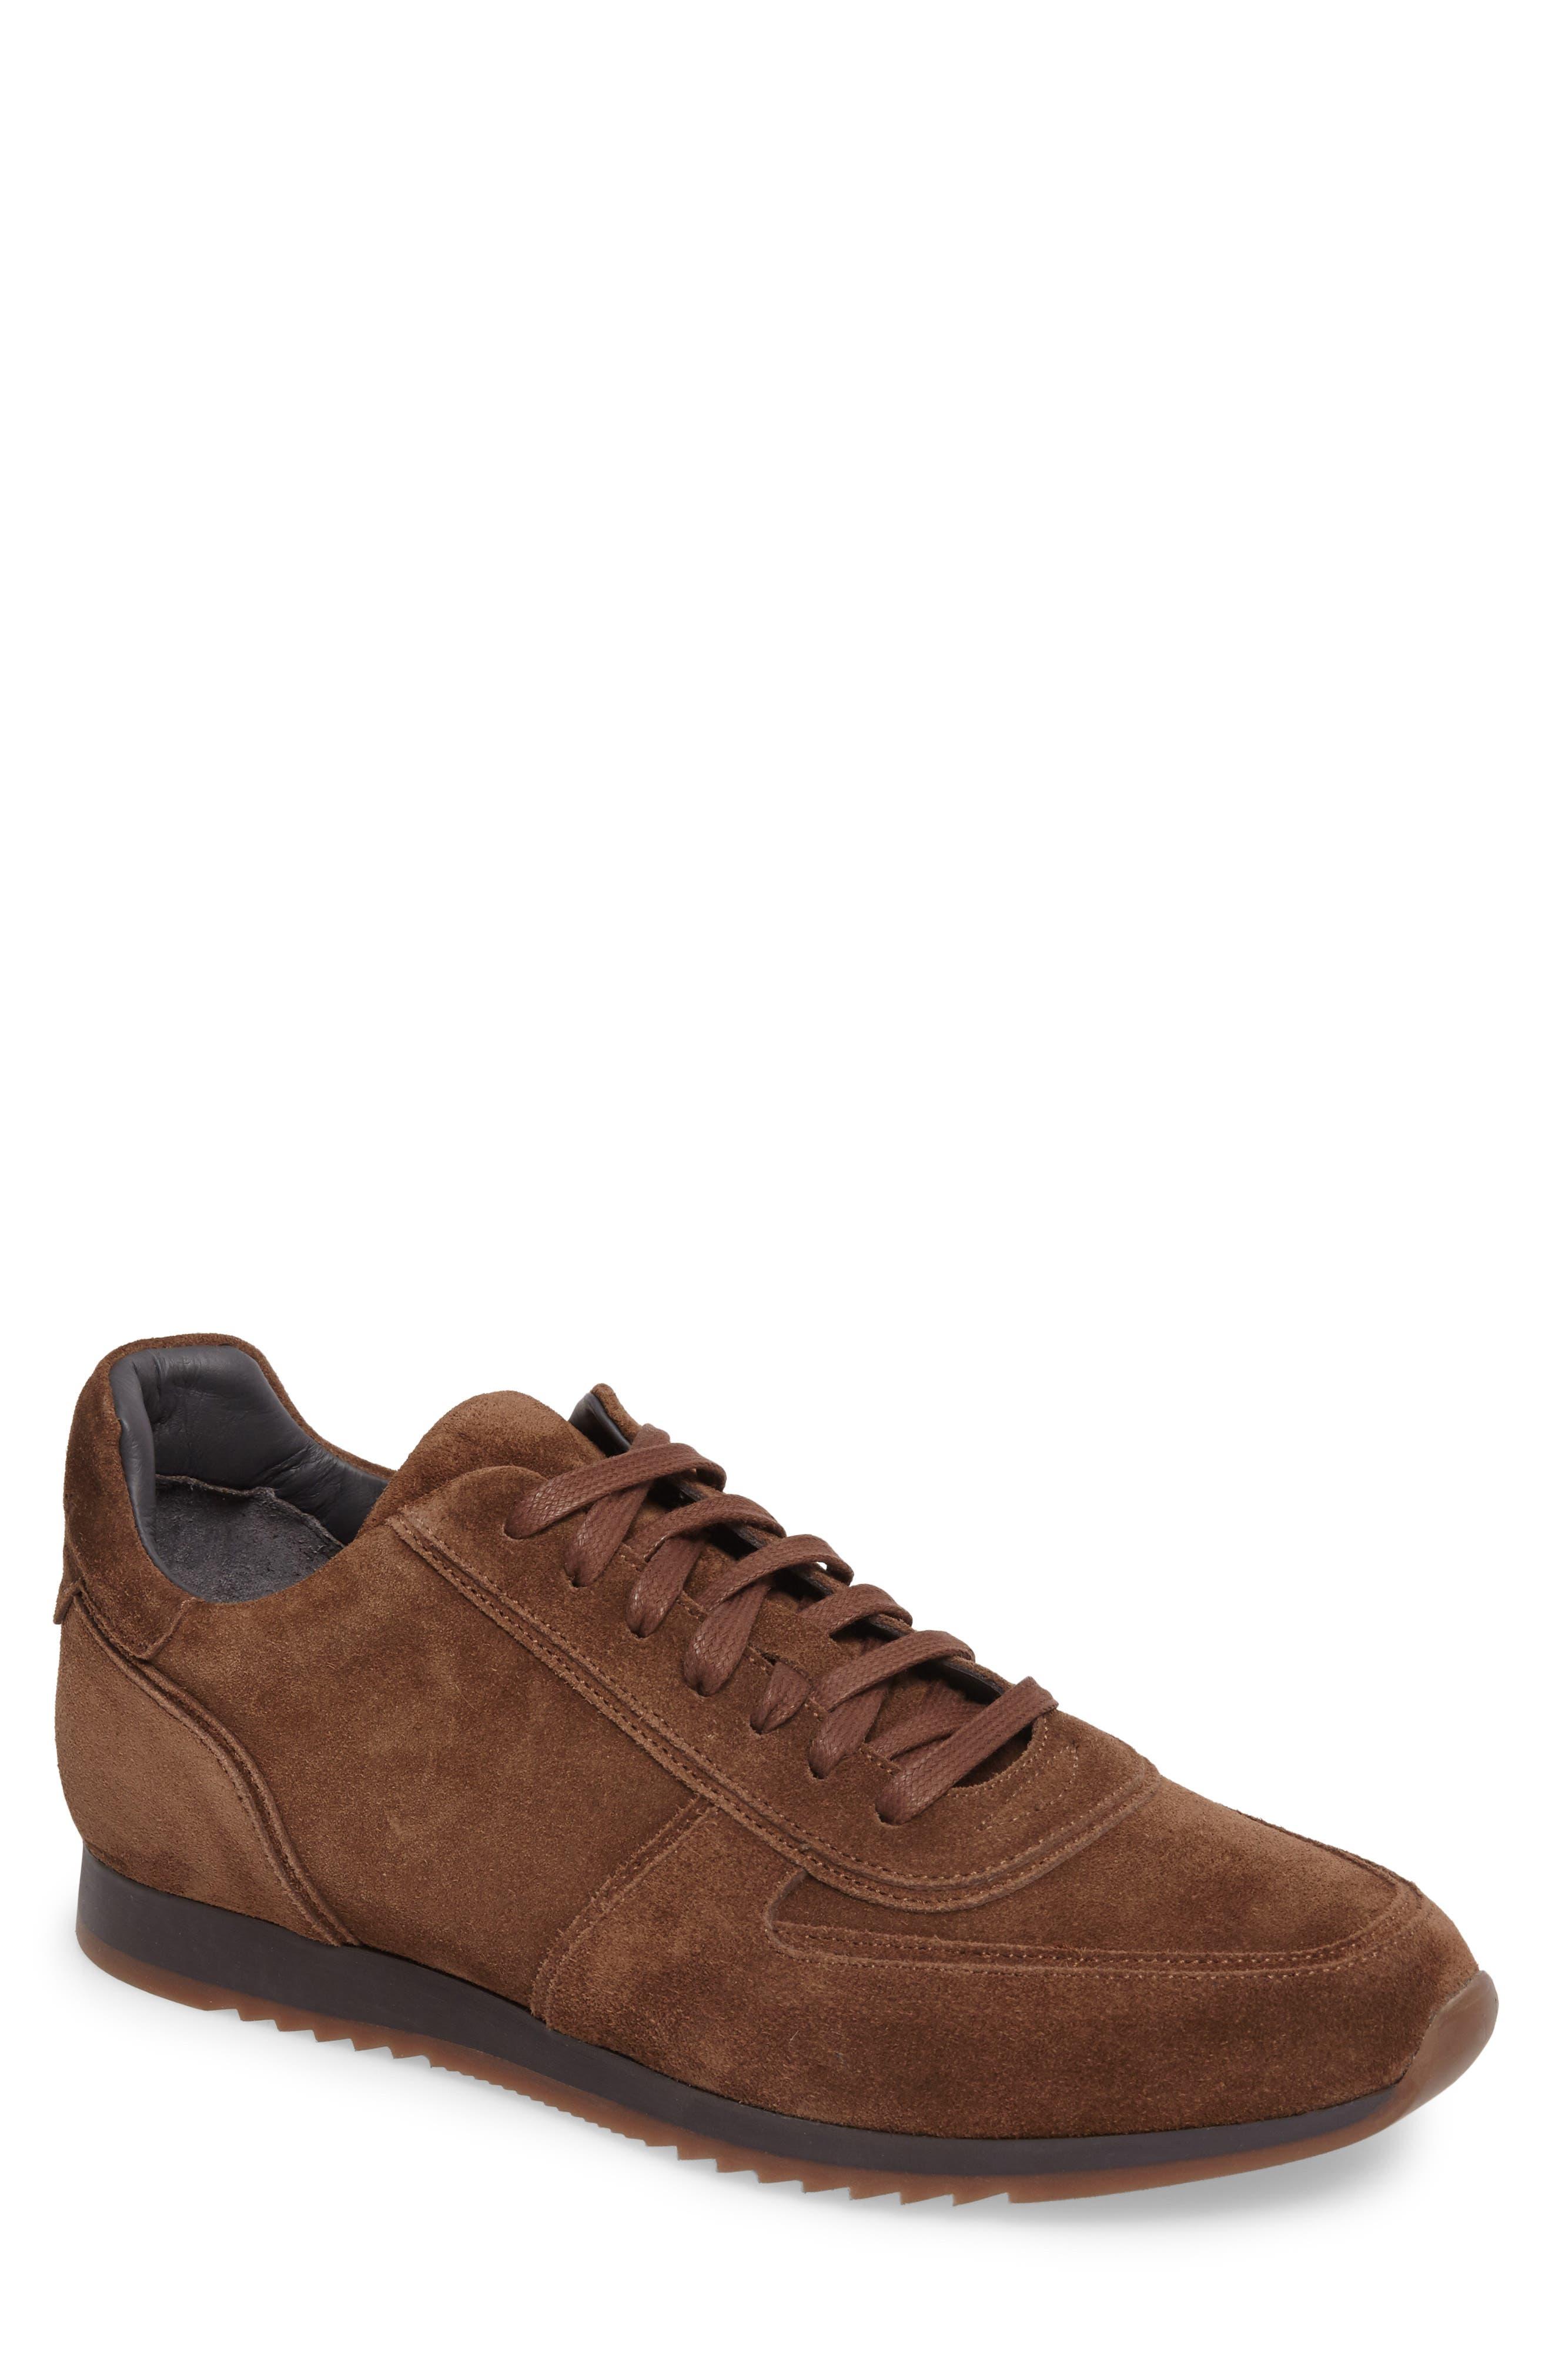 Hatton Sneaker,                         Main,                         color, Softy Marrone